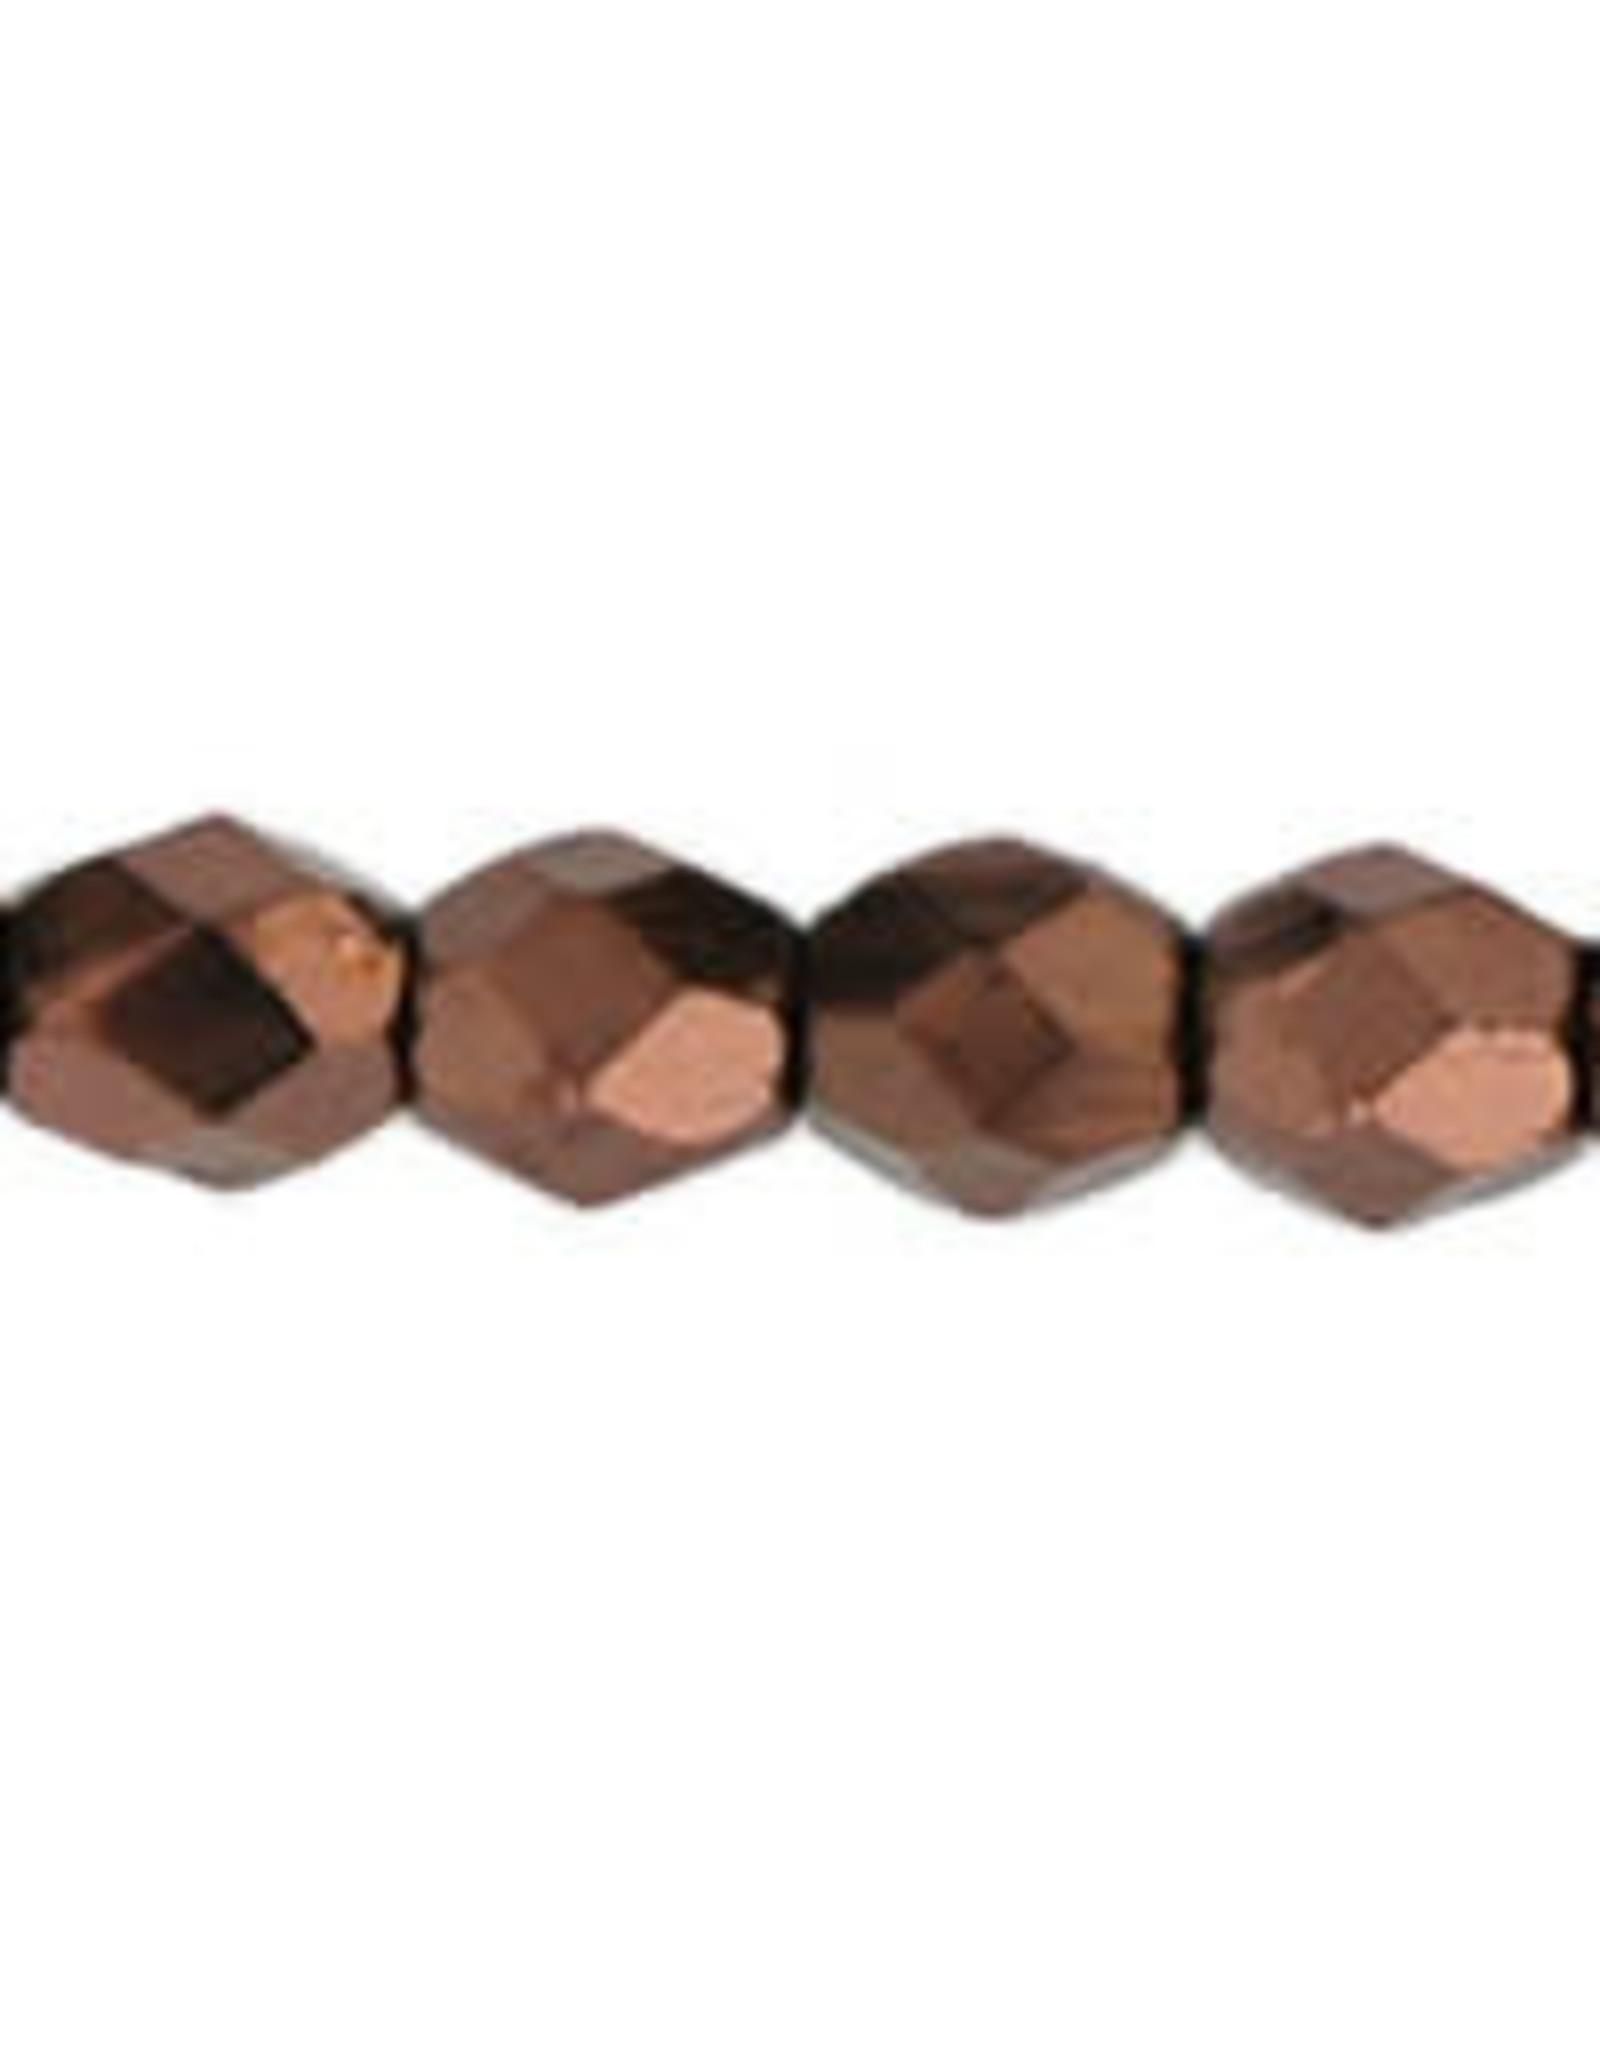 Czech 3mm Fire Polish Dark Bronze Brown Metallic  x50